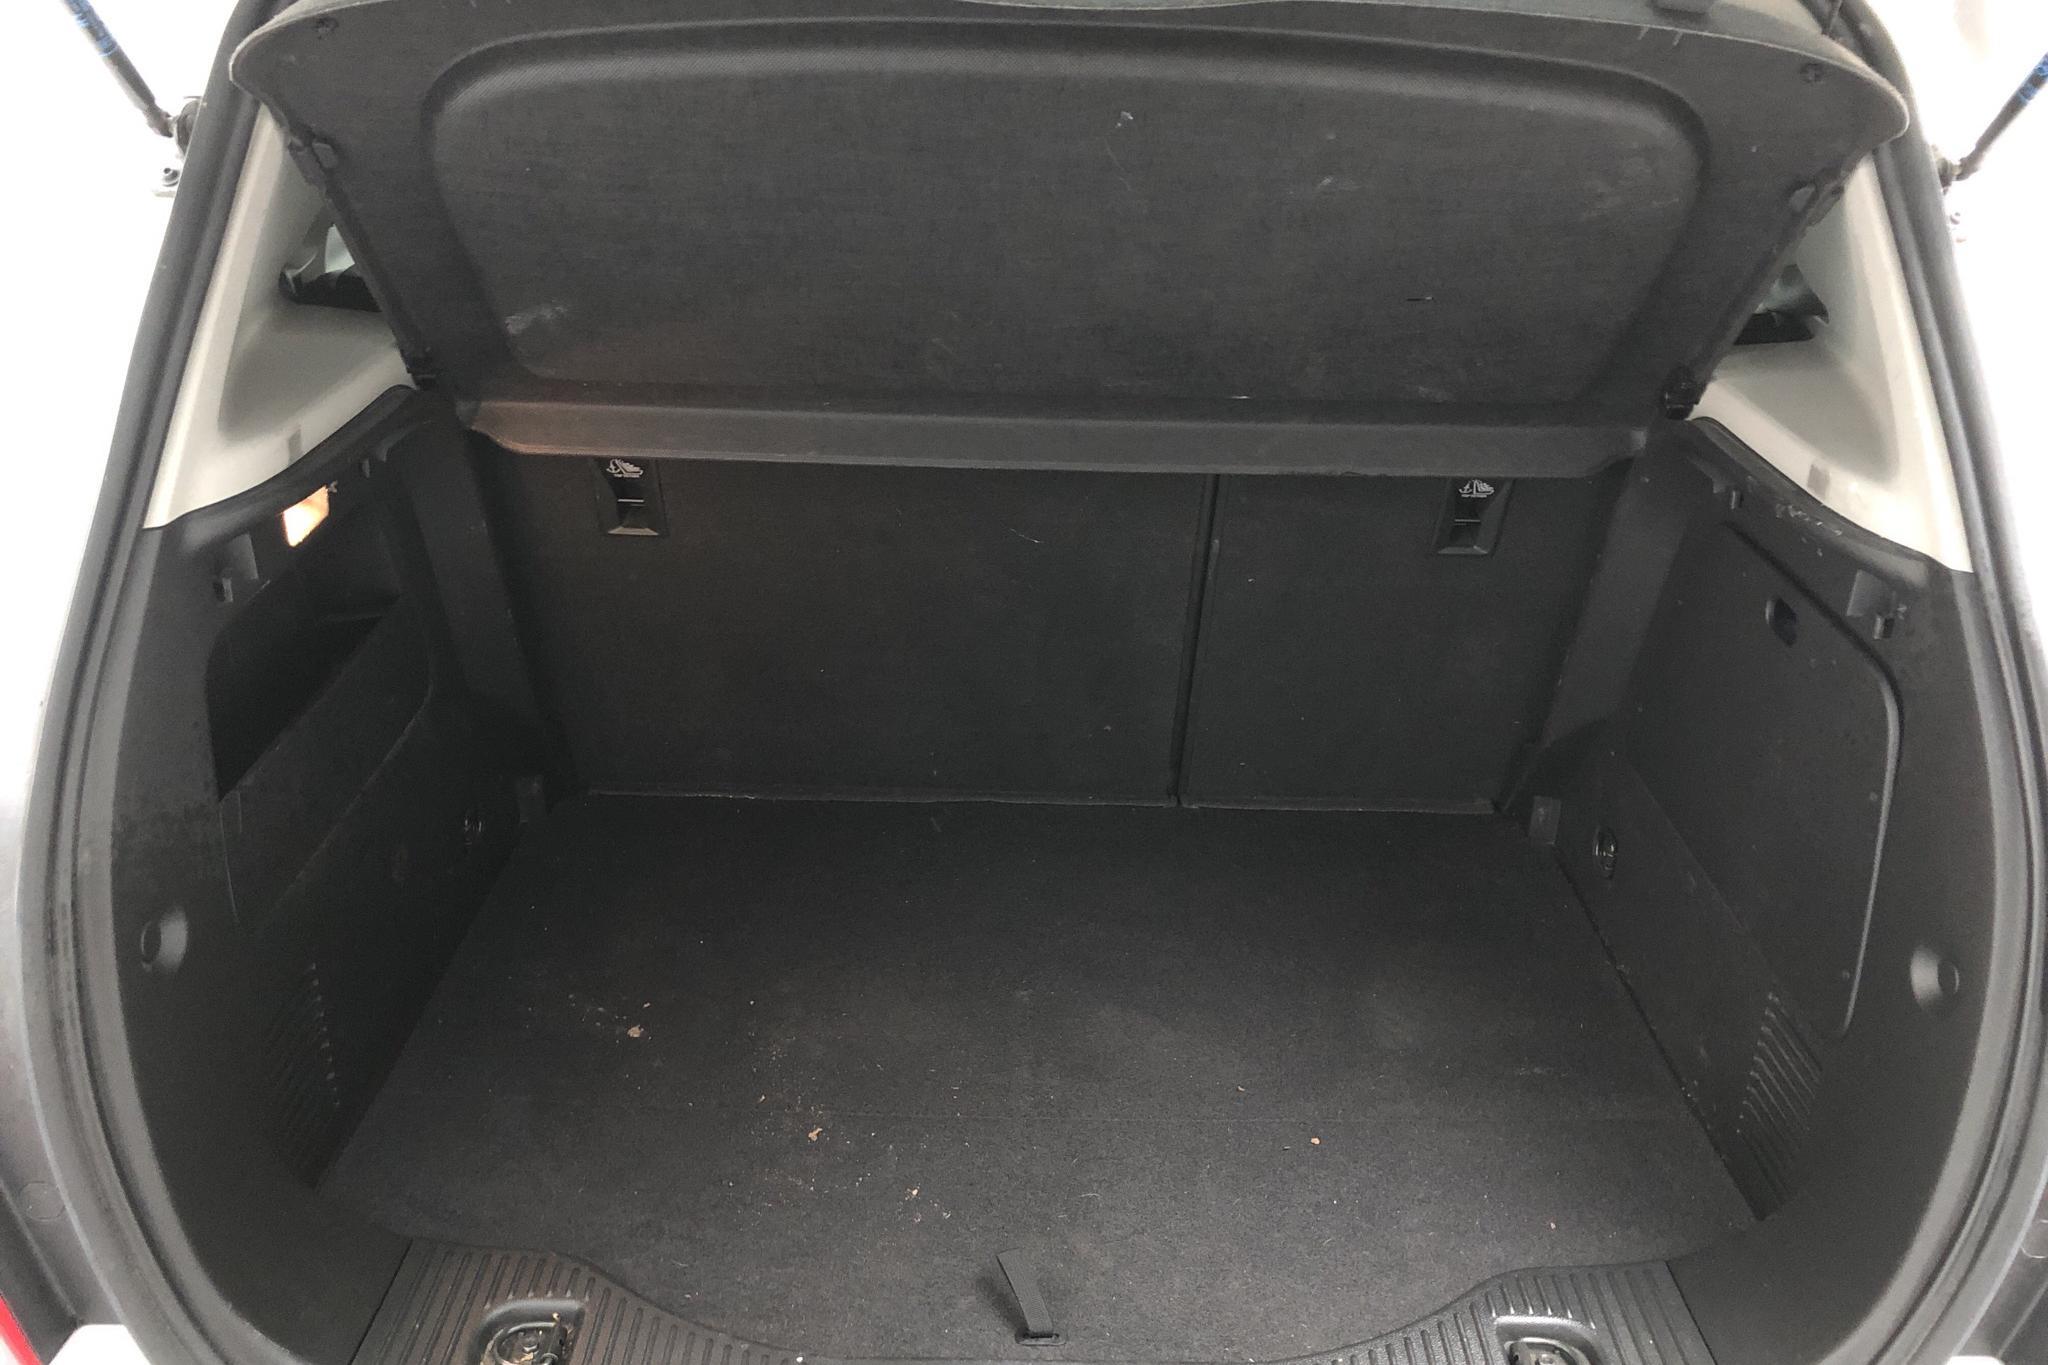 Chevrolet Trax 1.7D 2WD (130hk) - 53 000 km - Automatic - white - 2014